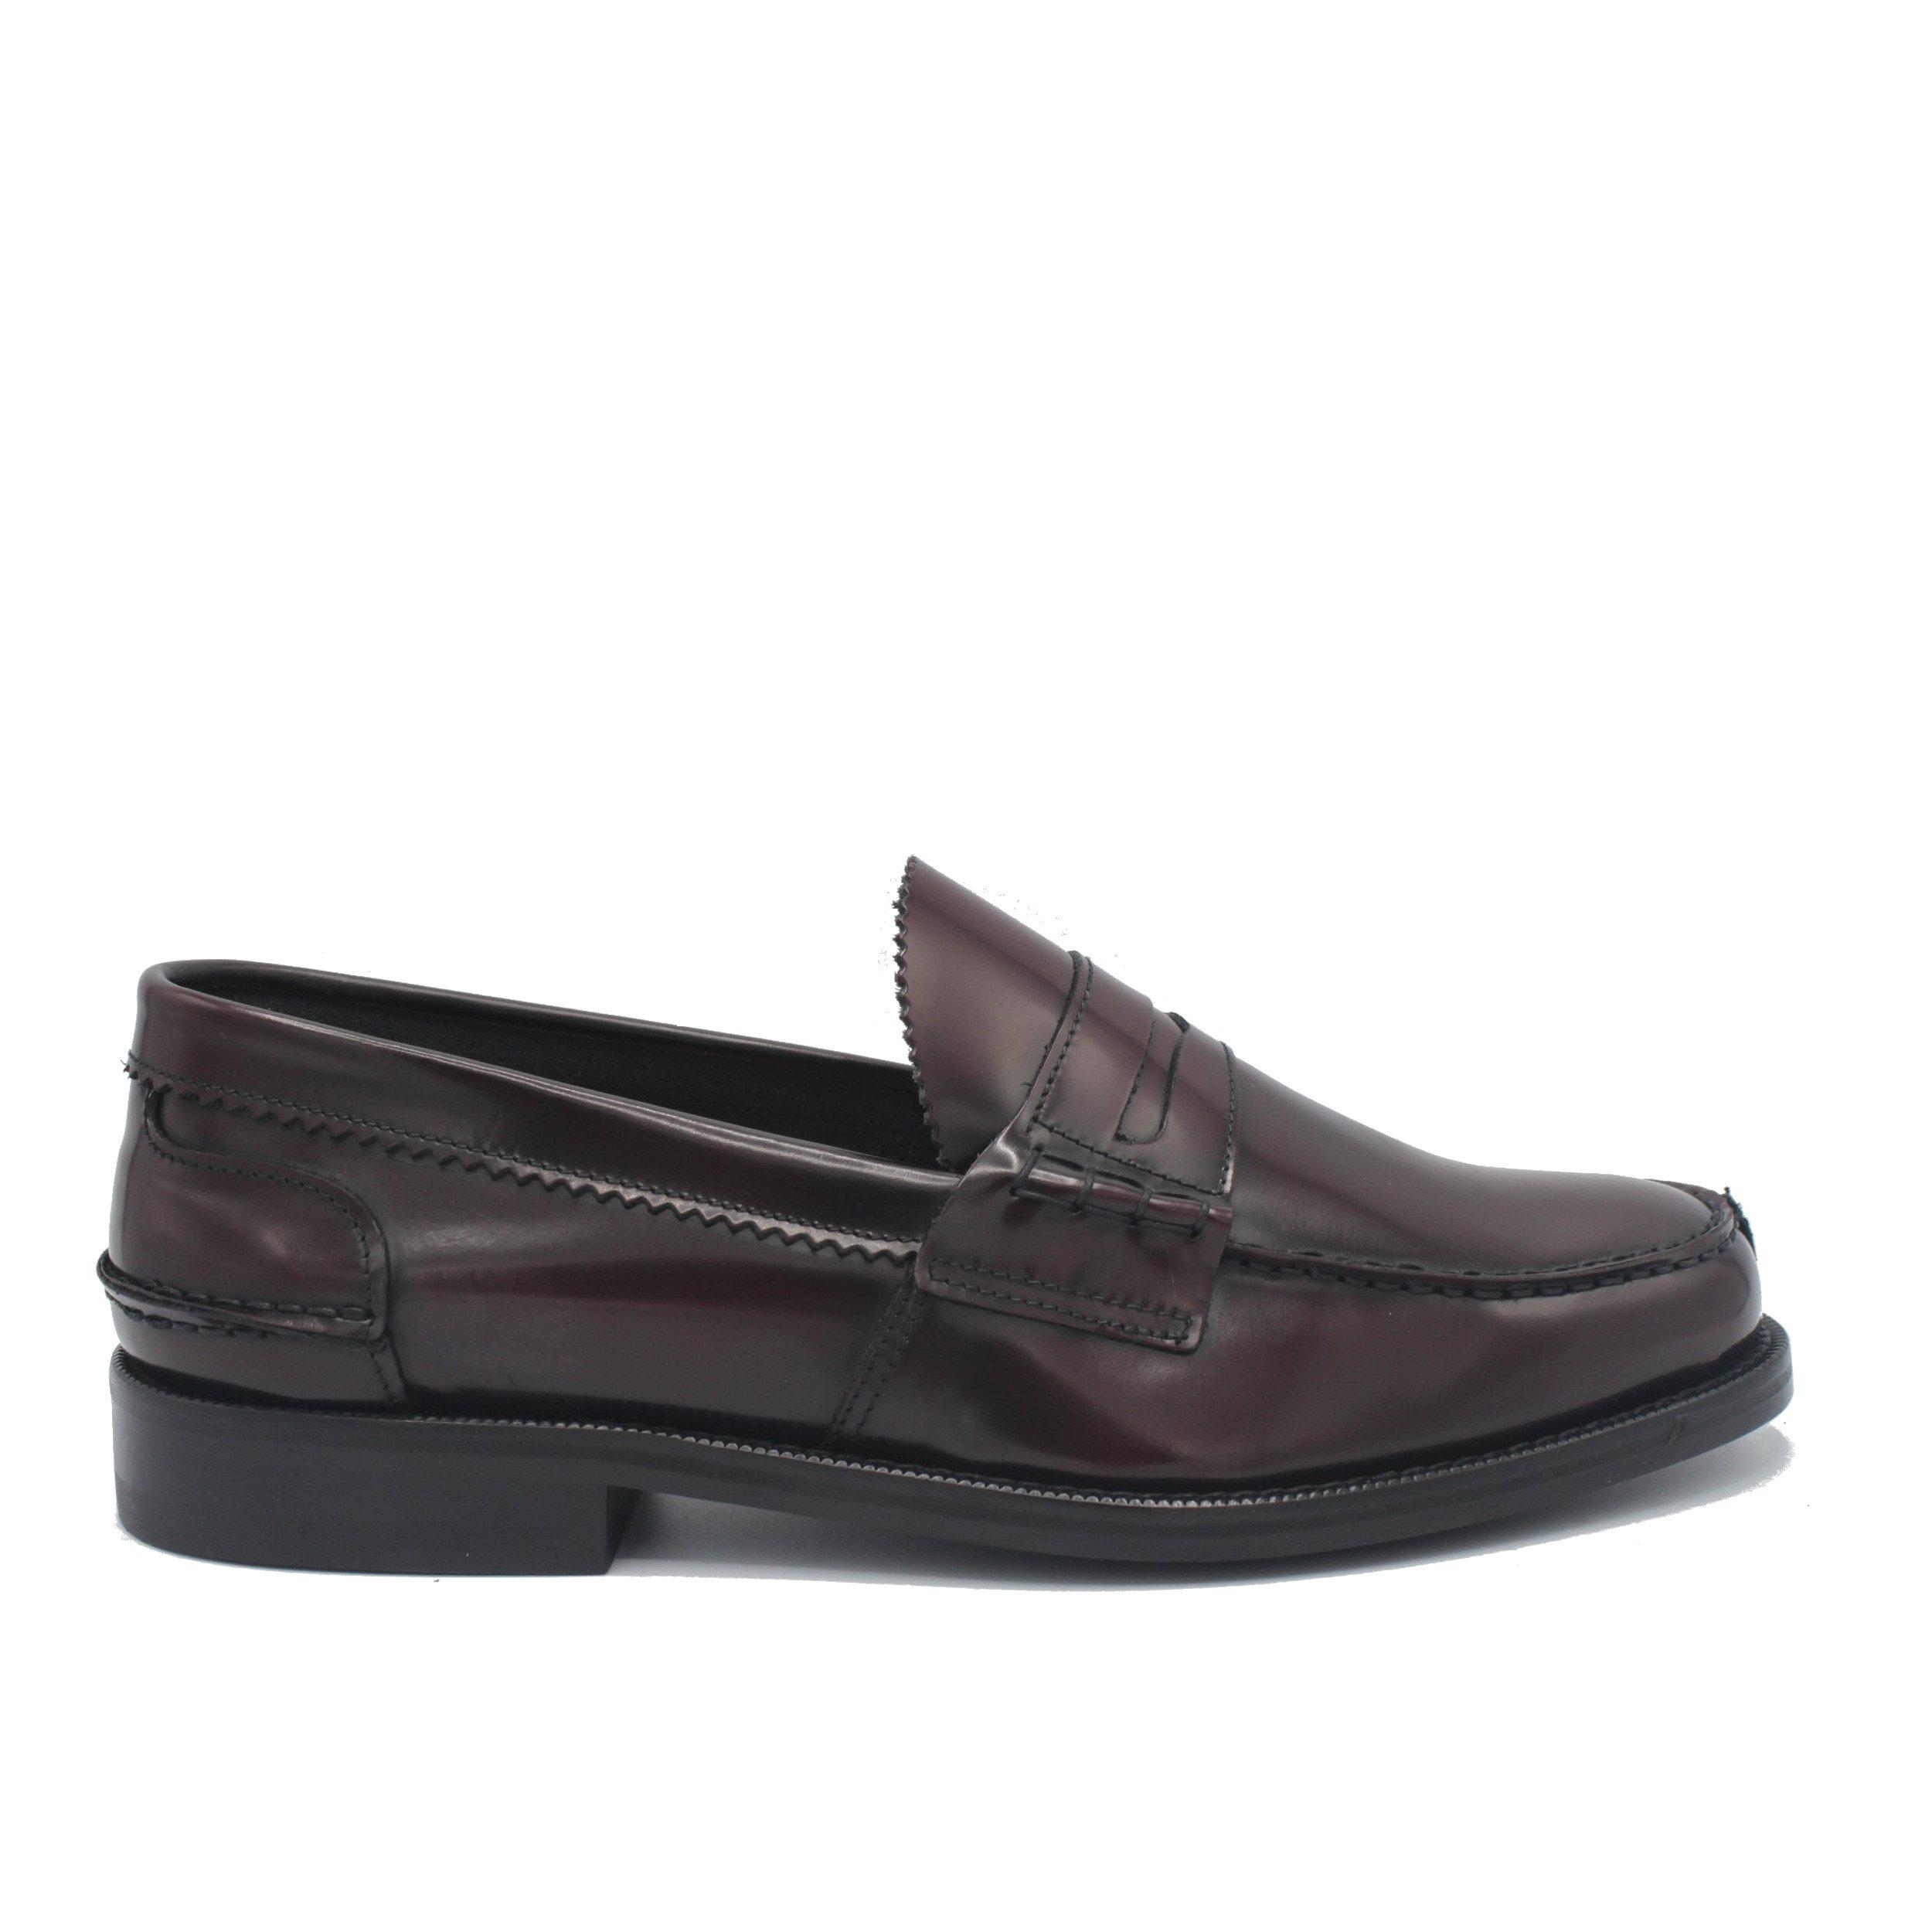 Saxone of Scotland Men's Spazzolato Leather Loafer Bordeaux 1000_Bordeaux - EU42/US9